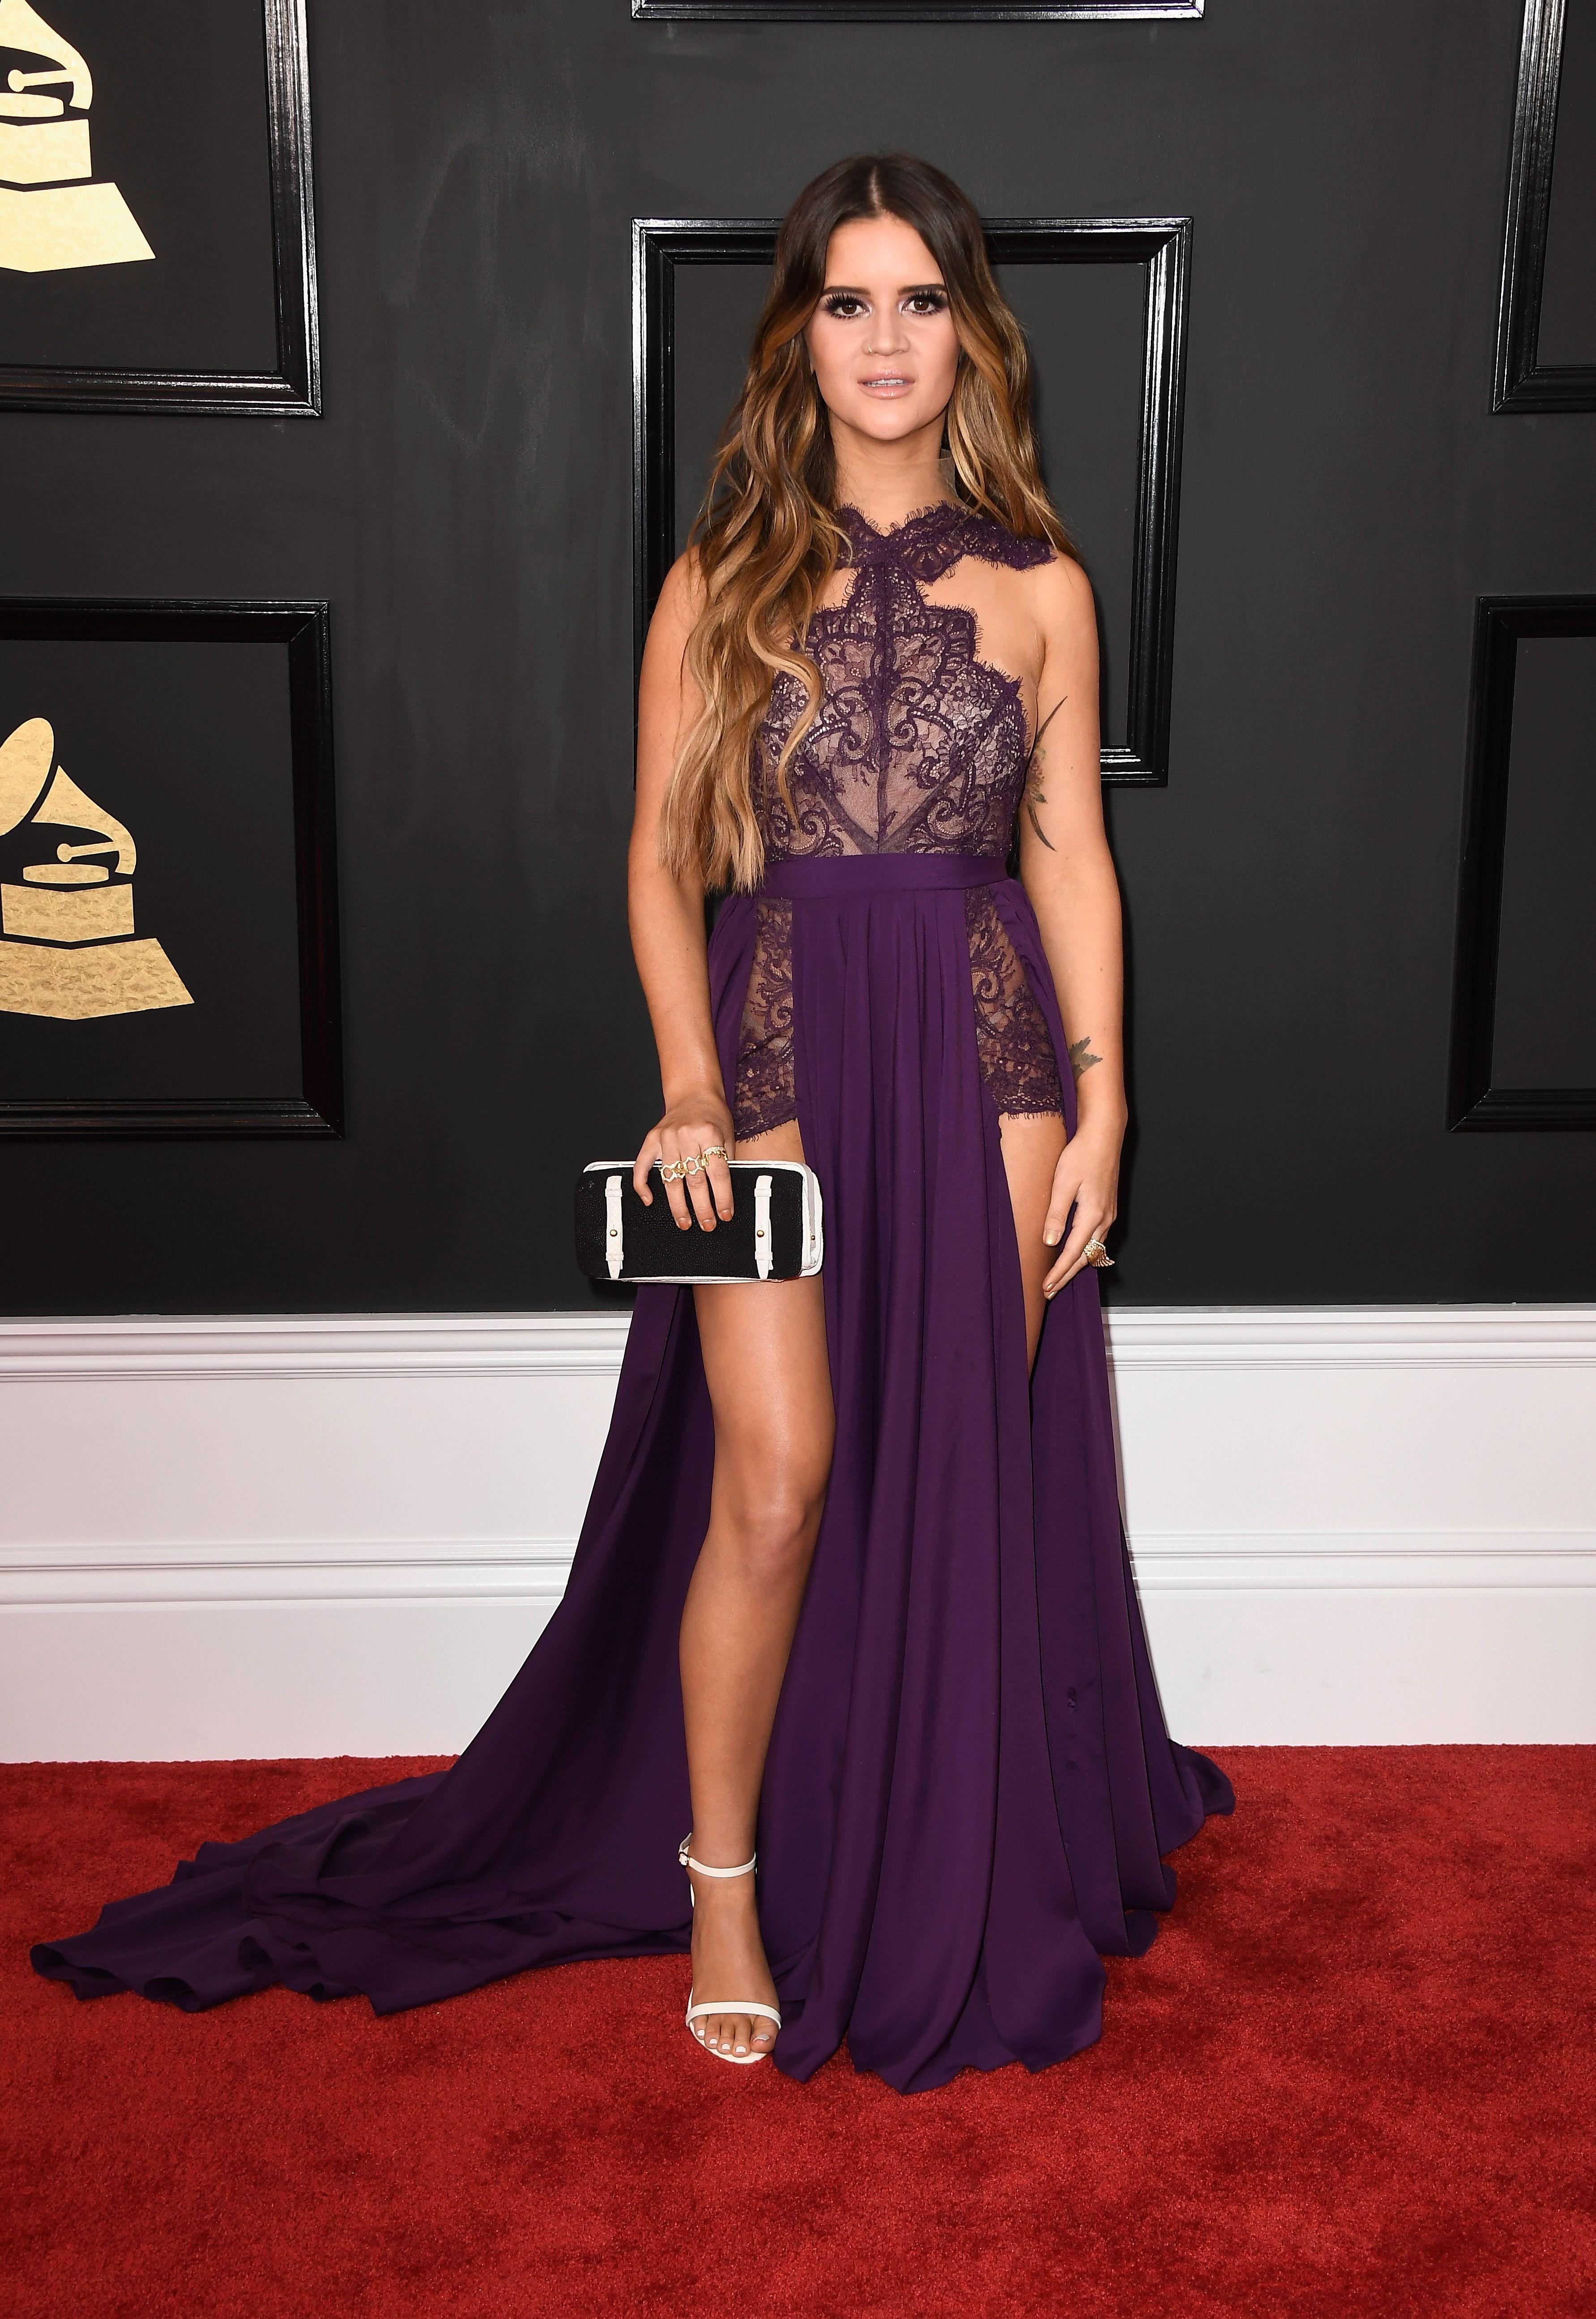 Communication on this topic: Jessica alba boobs, diana-gordon-on-red-carpet-grammy-awards/